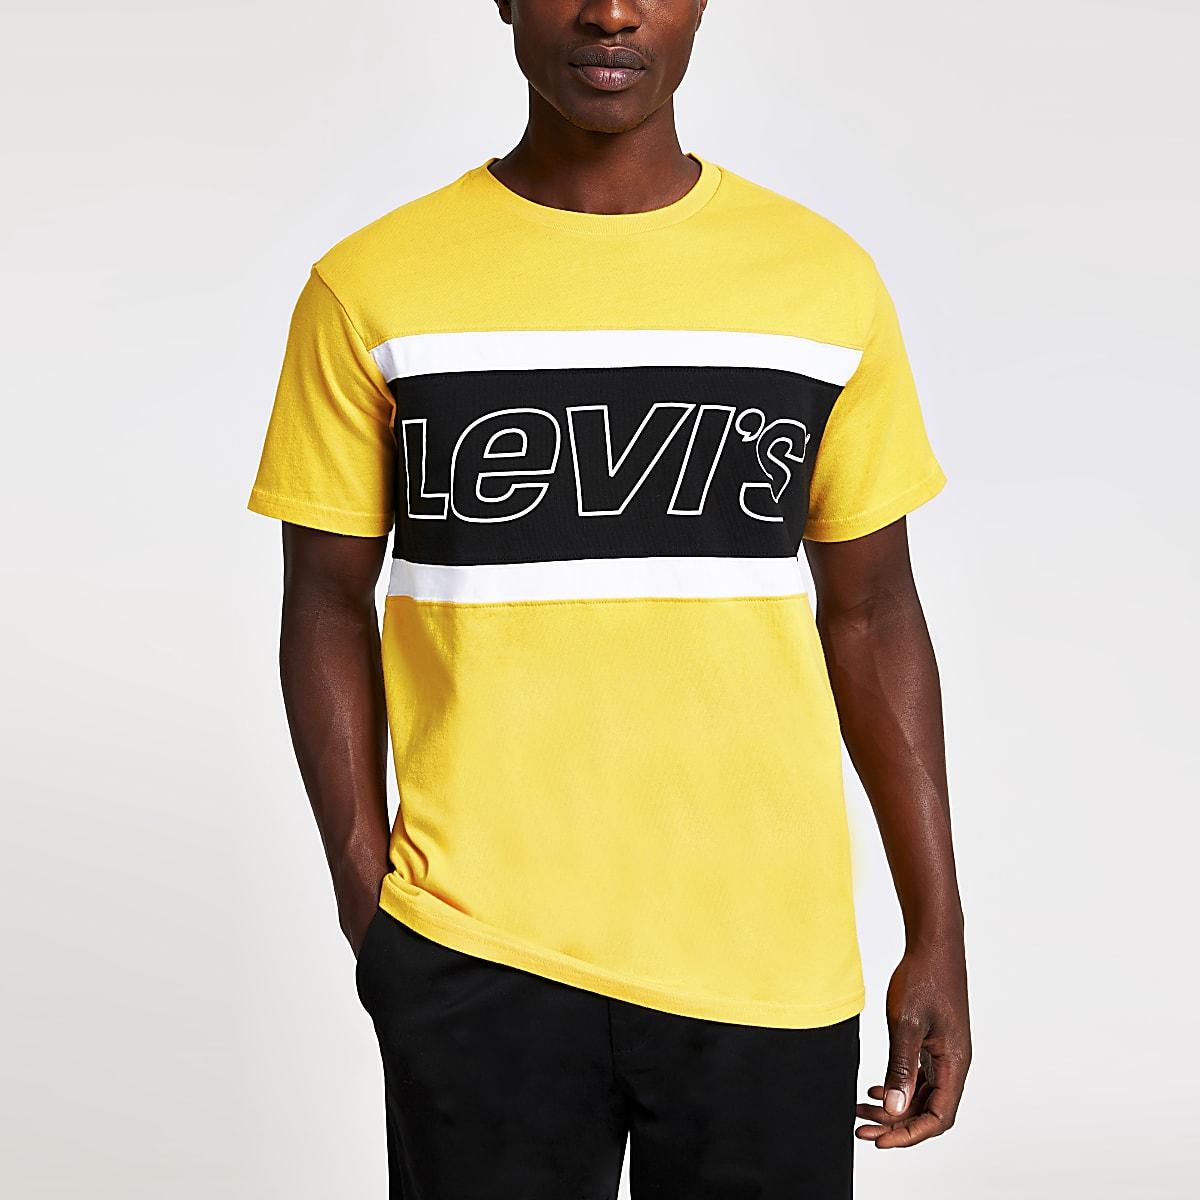 Levi's yellow block logo T-shirt